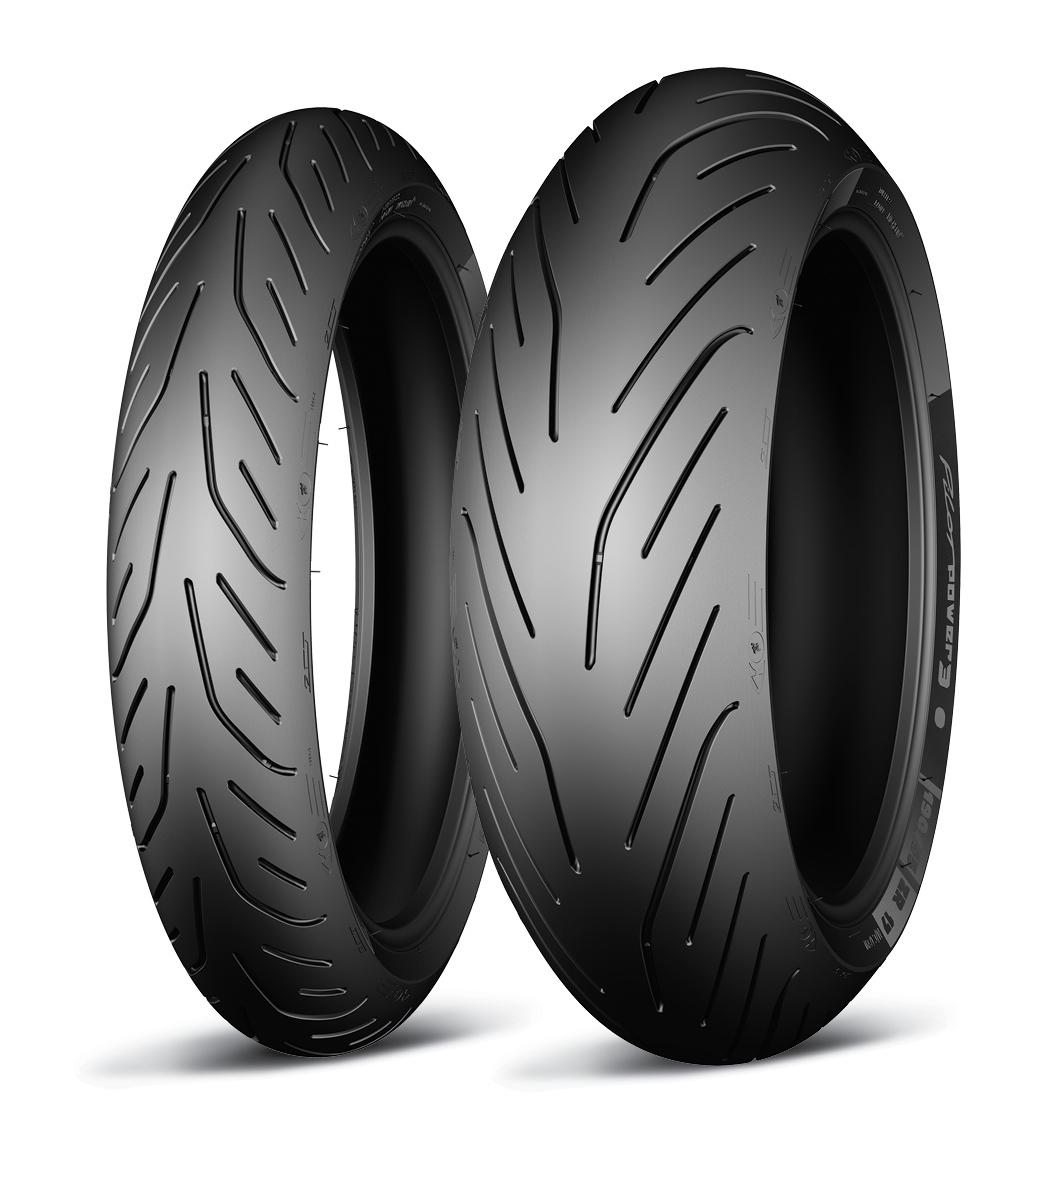 Michelin Pilot Power 3 - Moto rehvid